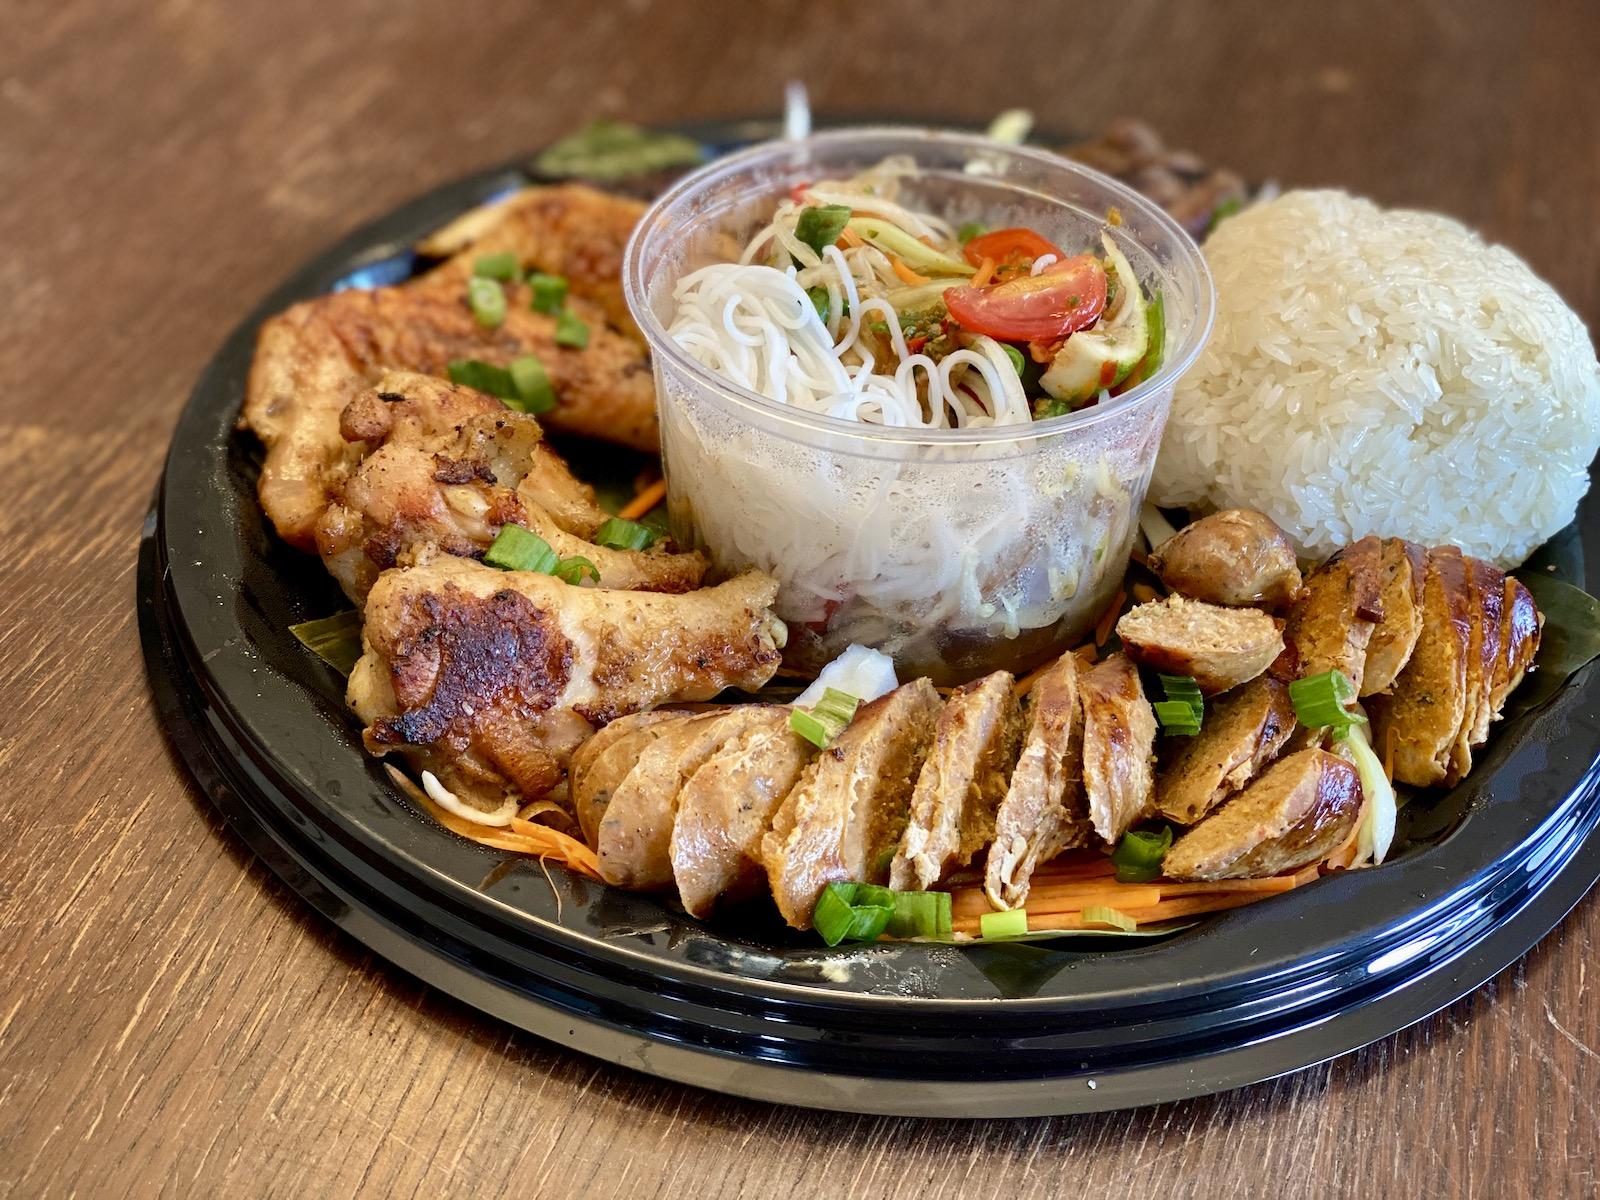 Lao street food platter